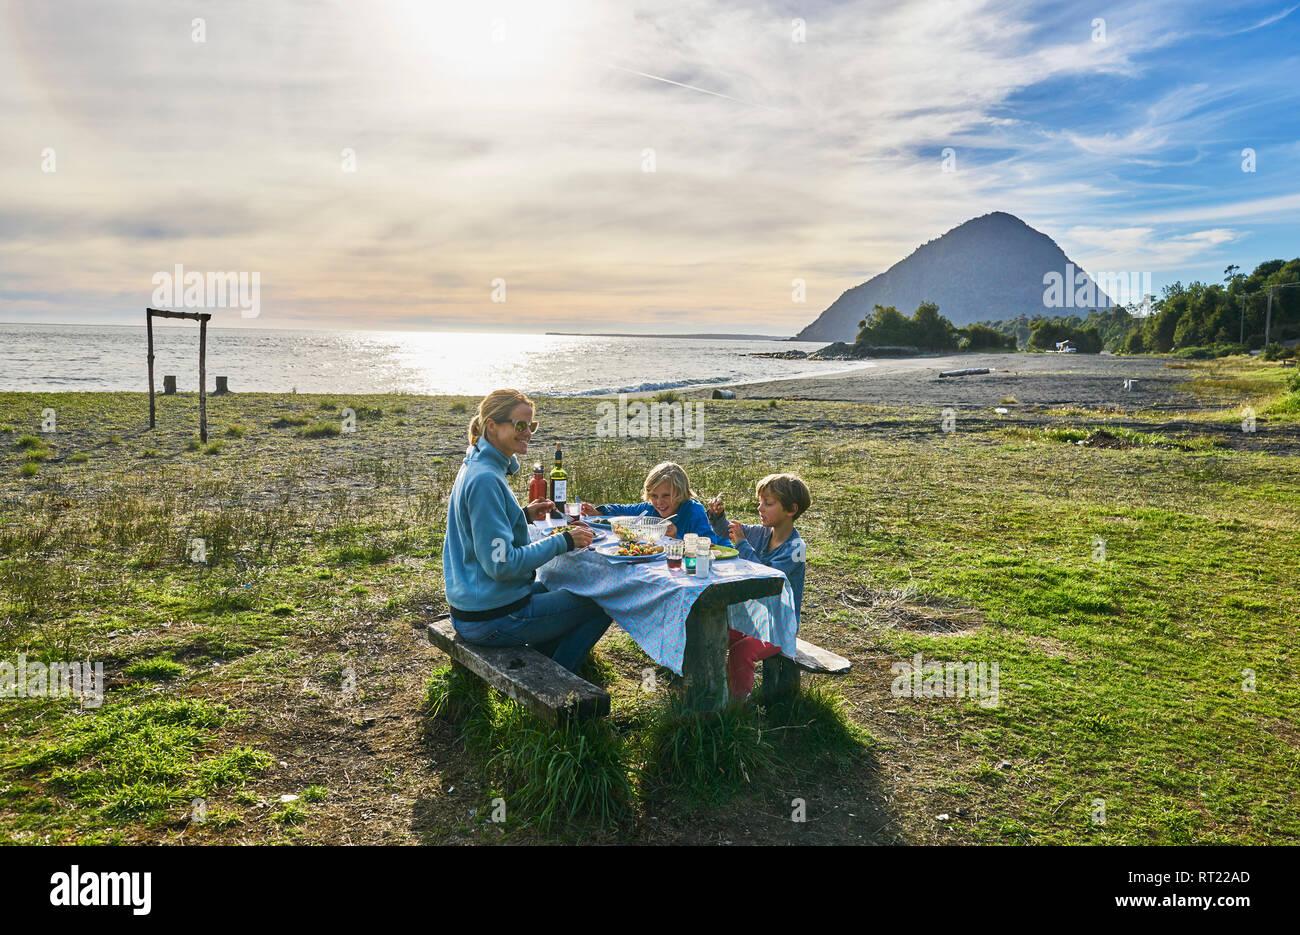 Chile, Chaiten, Carretera Austral, family having picnic at the beach - Stock Image